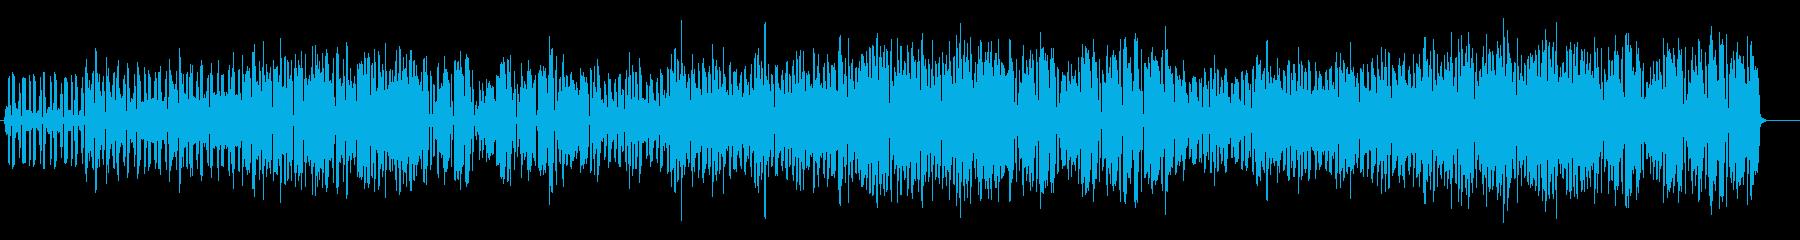 YouTube アコーディオン・軽快の再生済みの波形